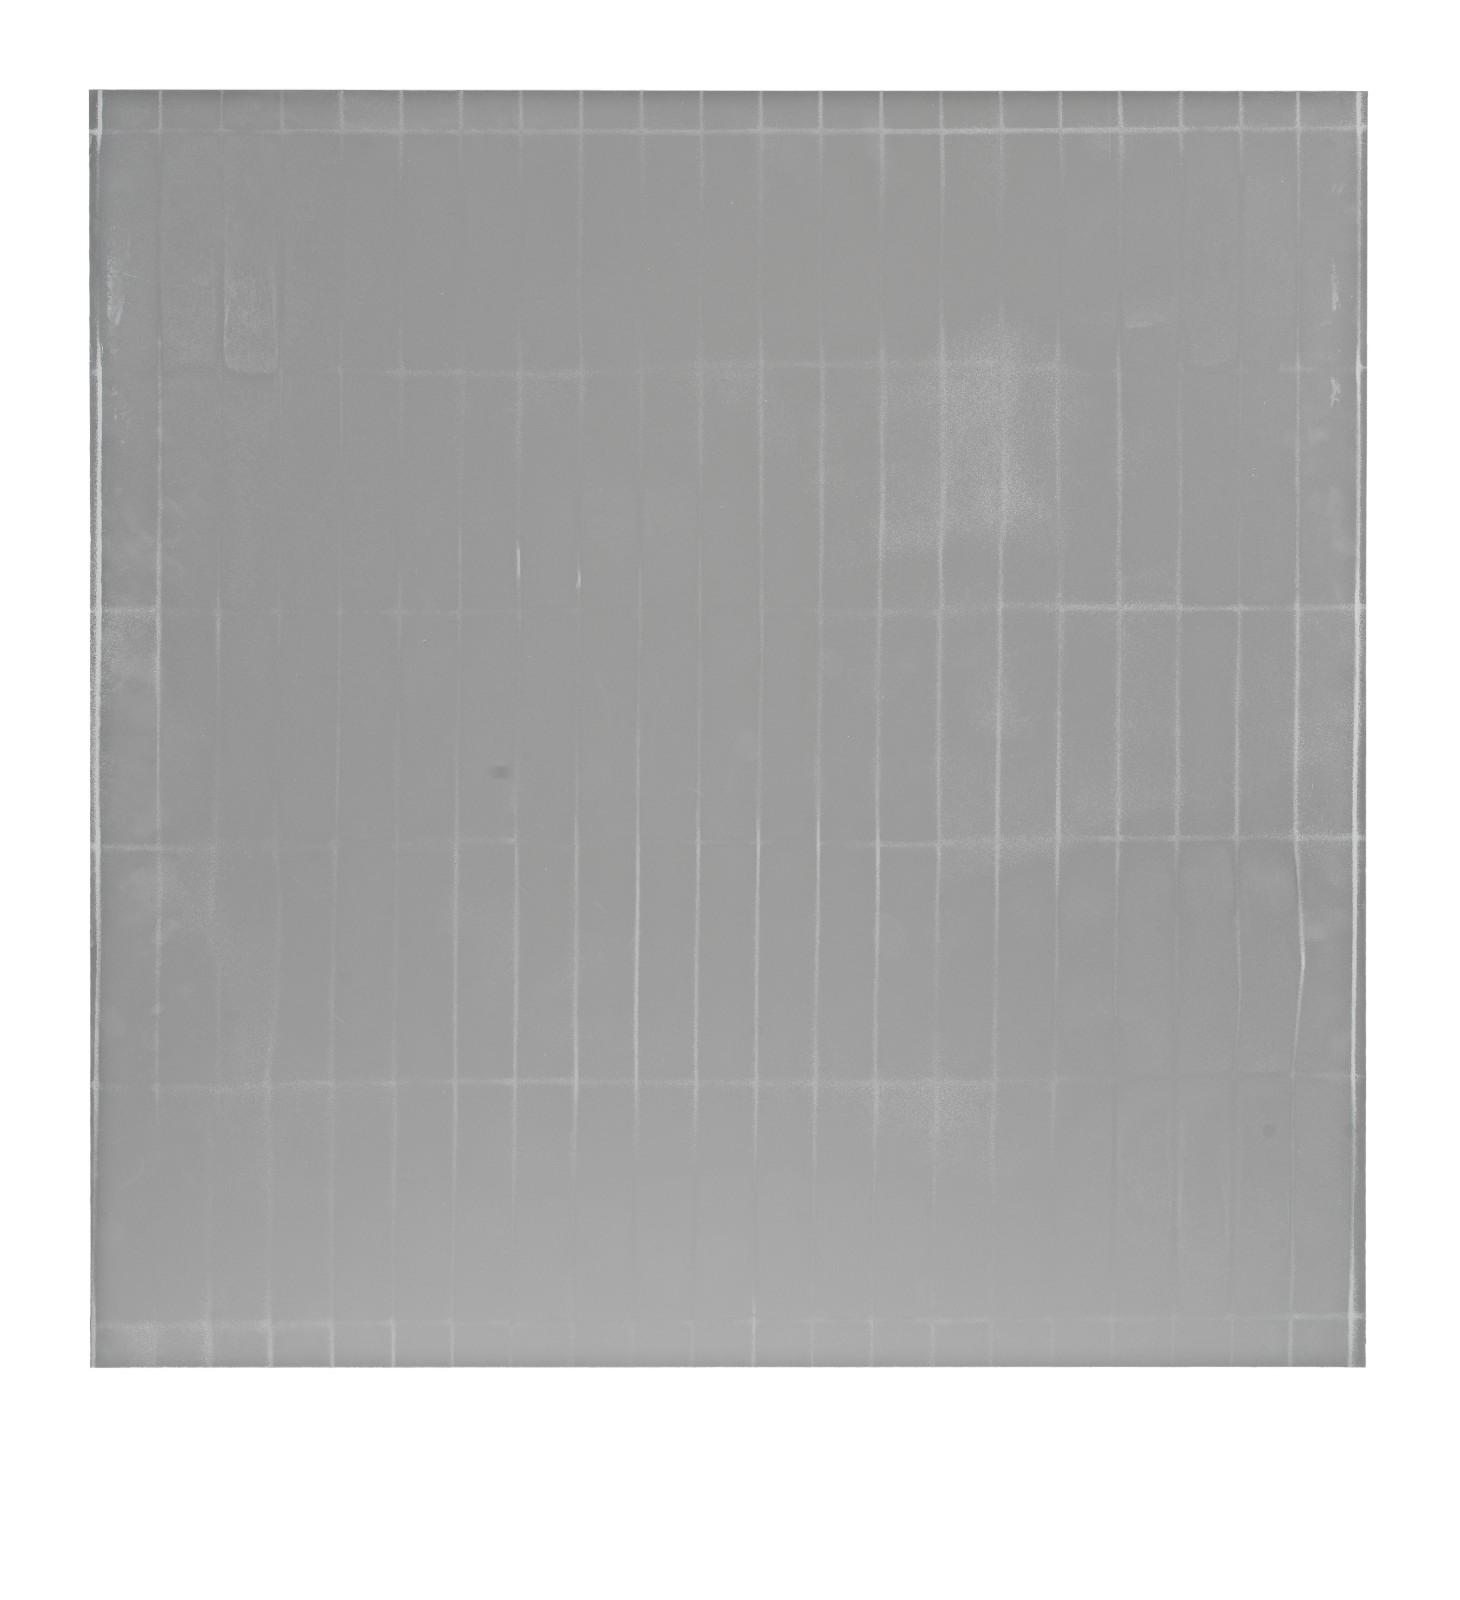 "STAIN : 55°36'49.5""N 13°01'34.9""E, 2016, spraypaint on aluminium, 81,3 x 81,3 cm"